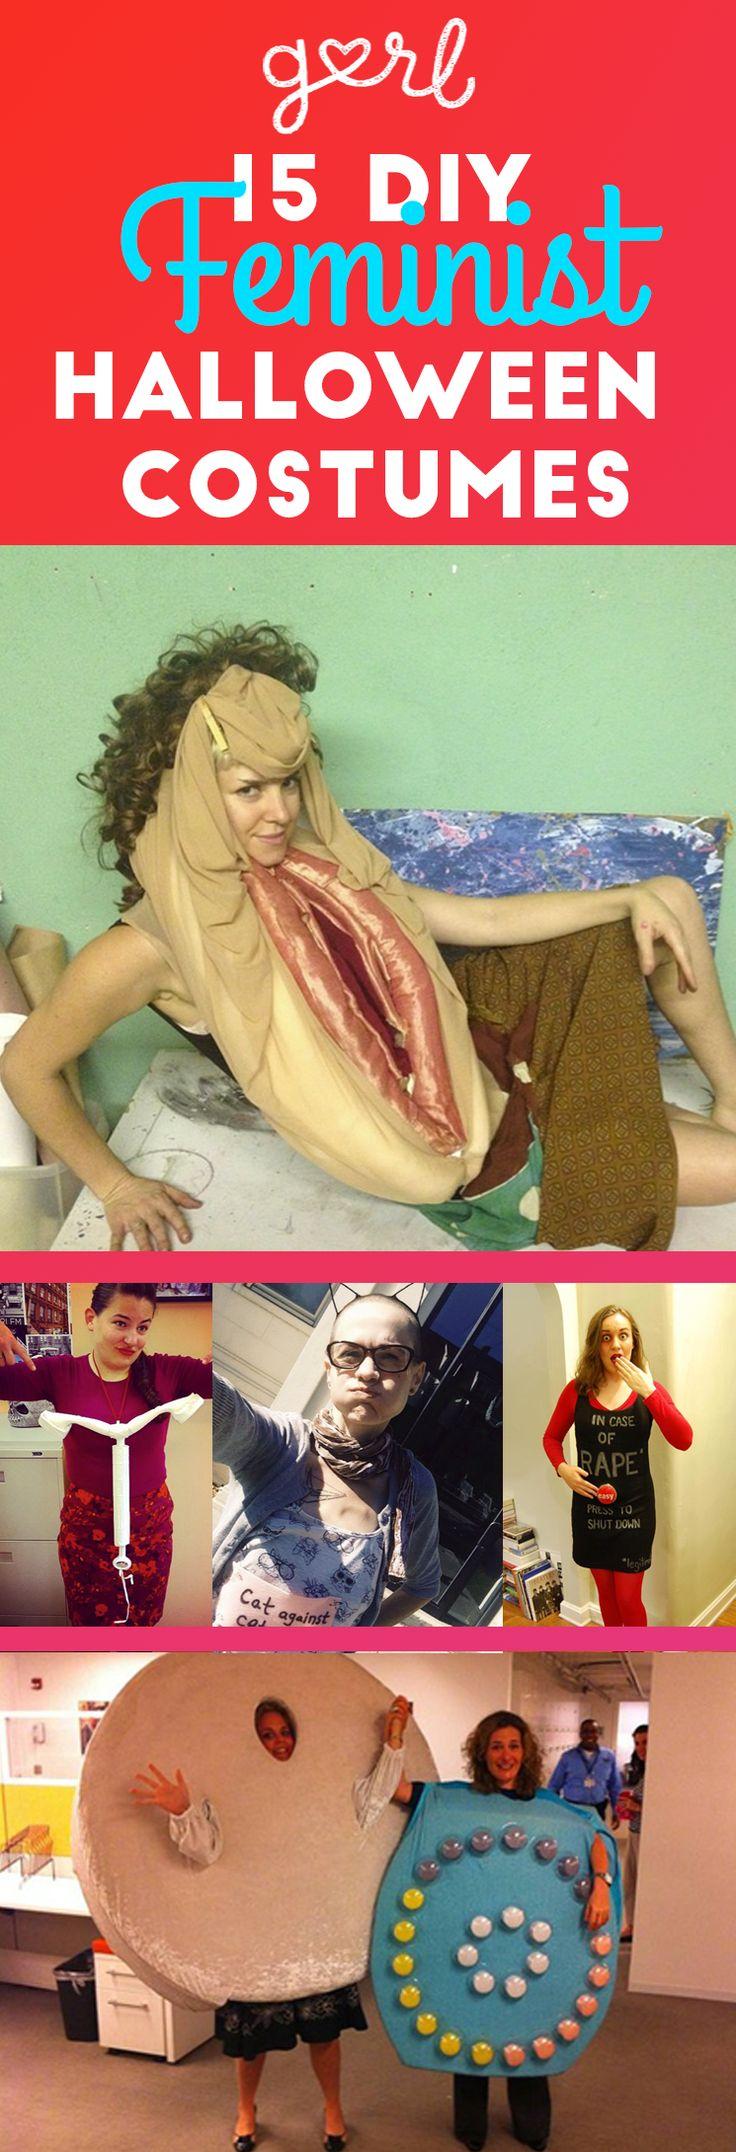 15 DIY Feminist Halloween Costumes Only Badass Girls Can Wear